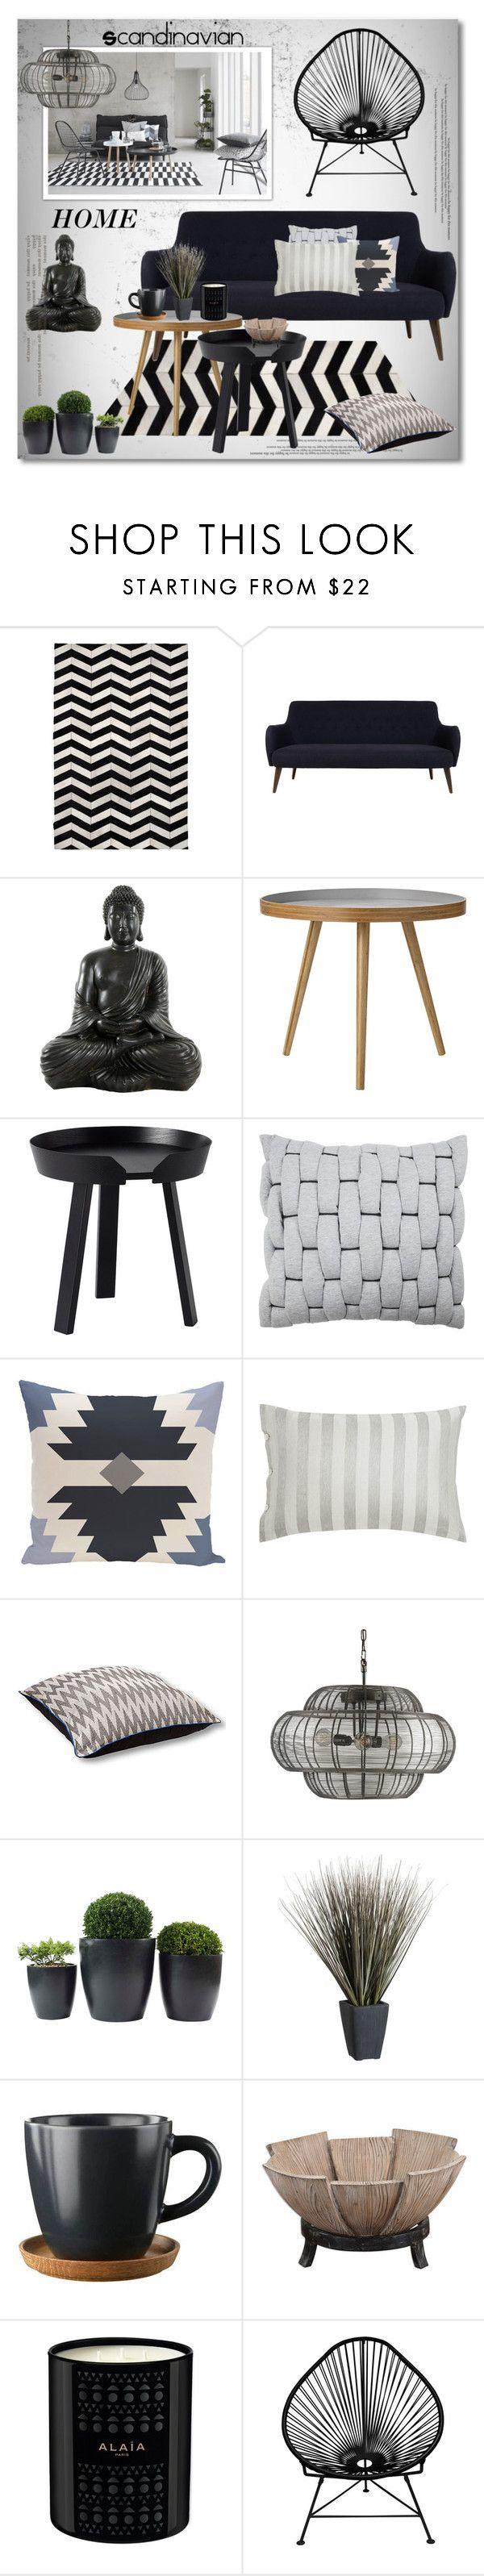 Best 25+ Retro Home Decor Ideas On Pinterest | Retro Bedrooms, Retro  Apartment And Pink Walls